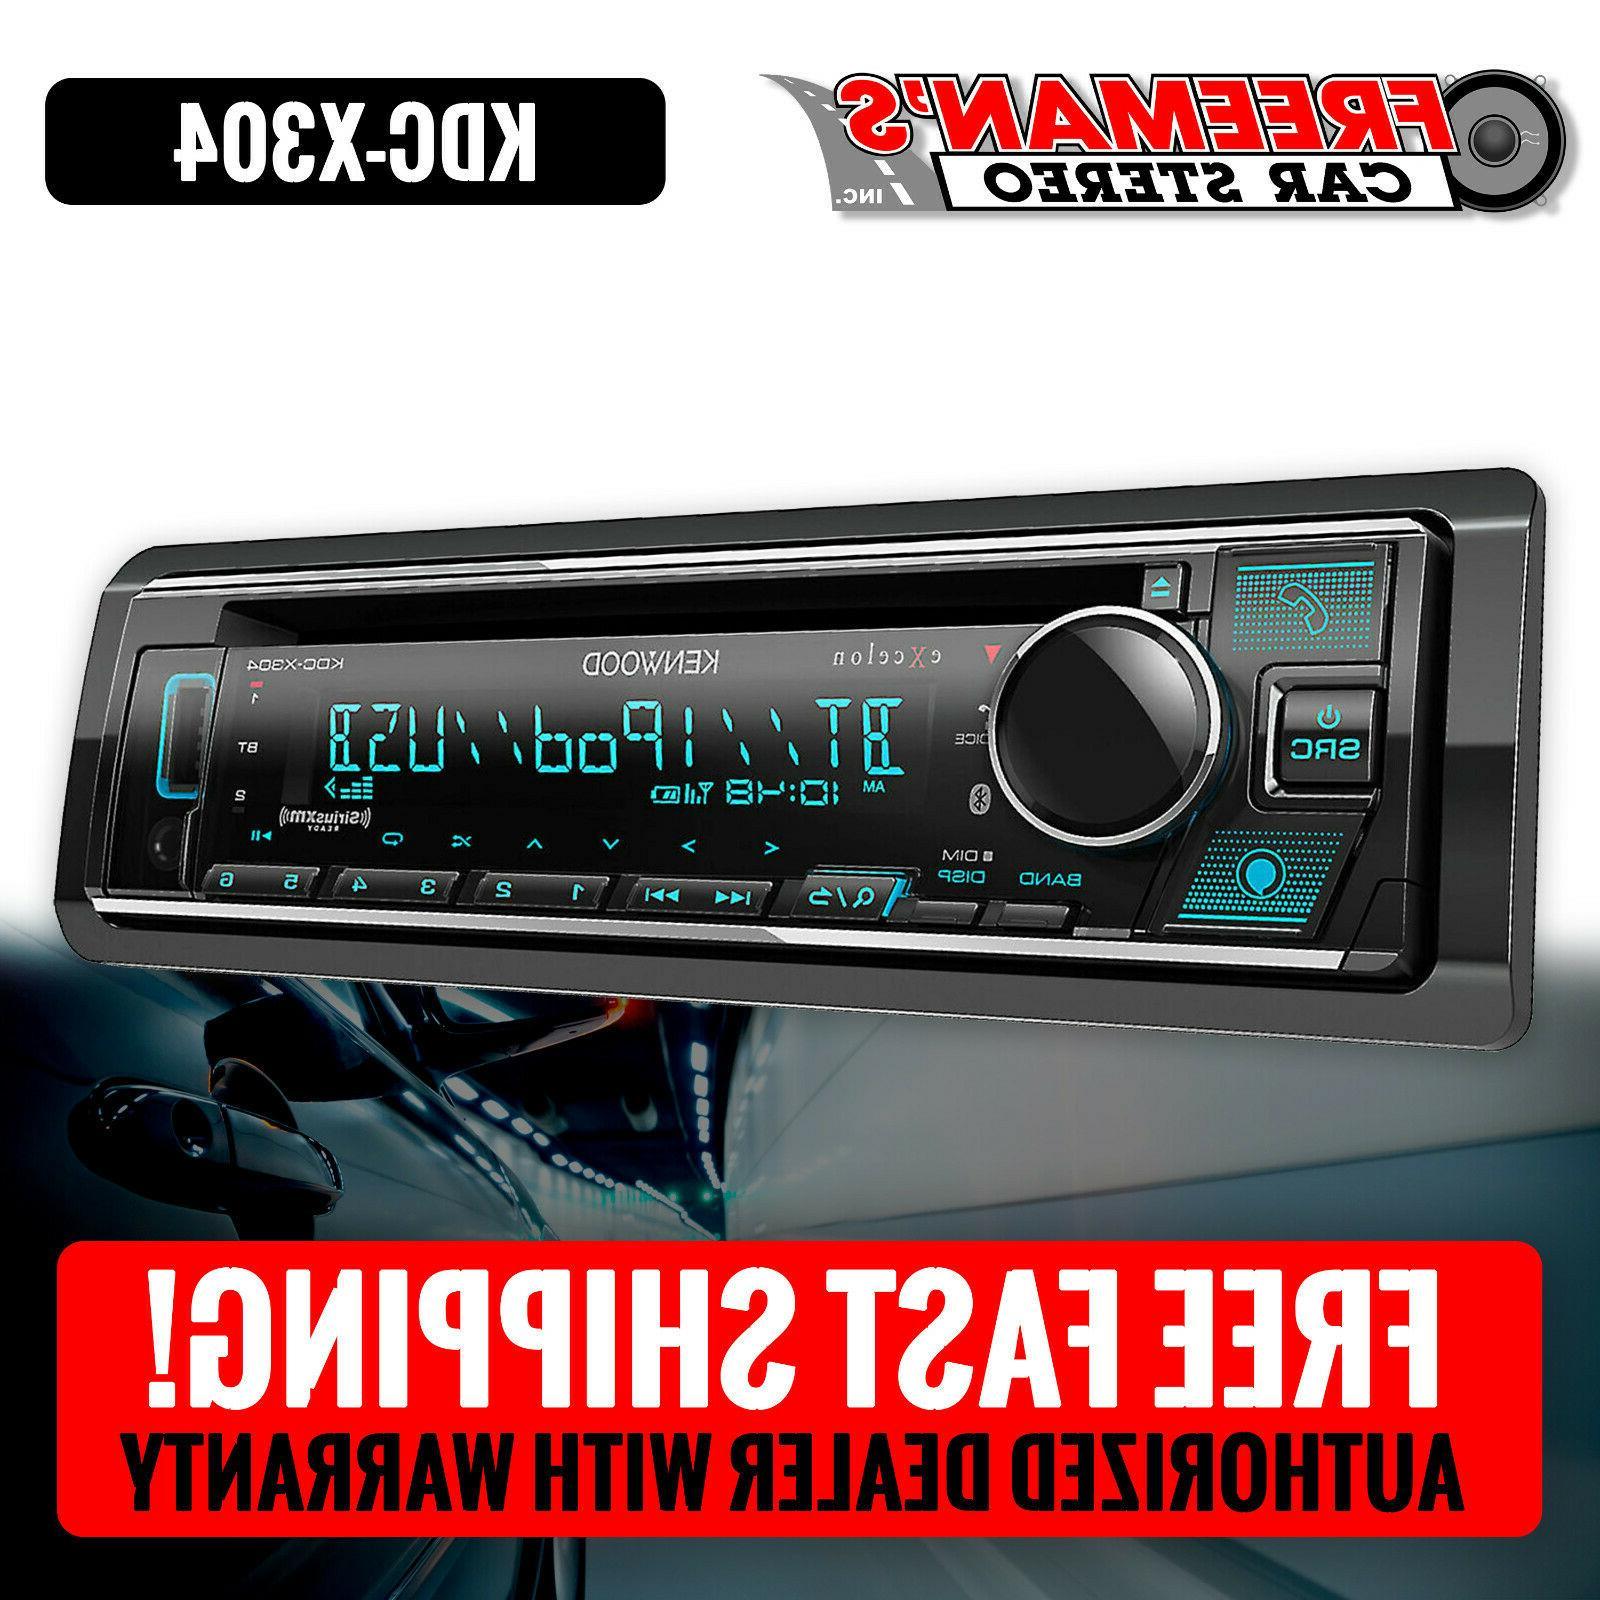 excelon kdc x304 car stereo cd receiver